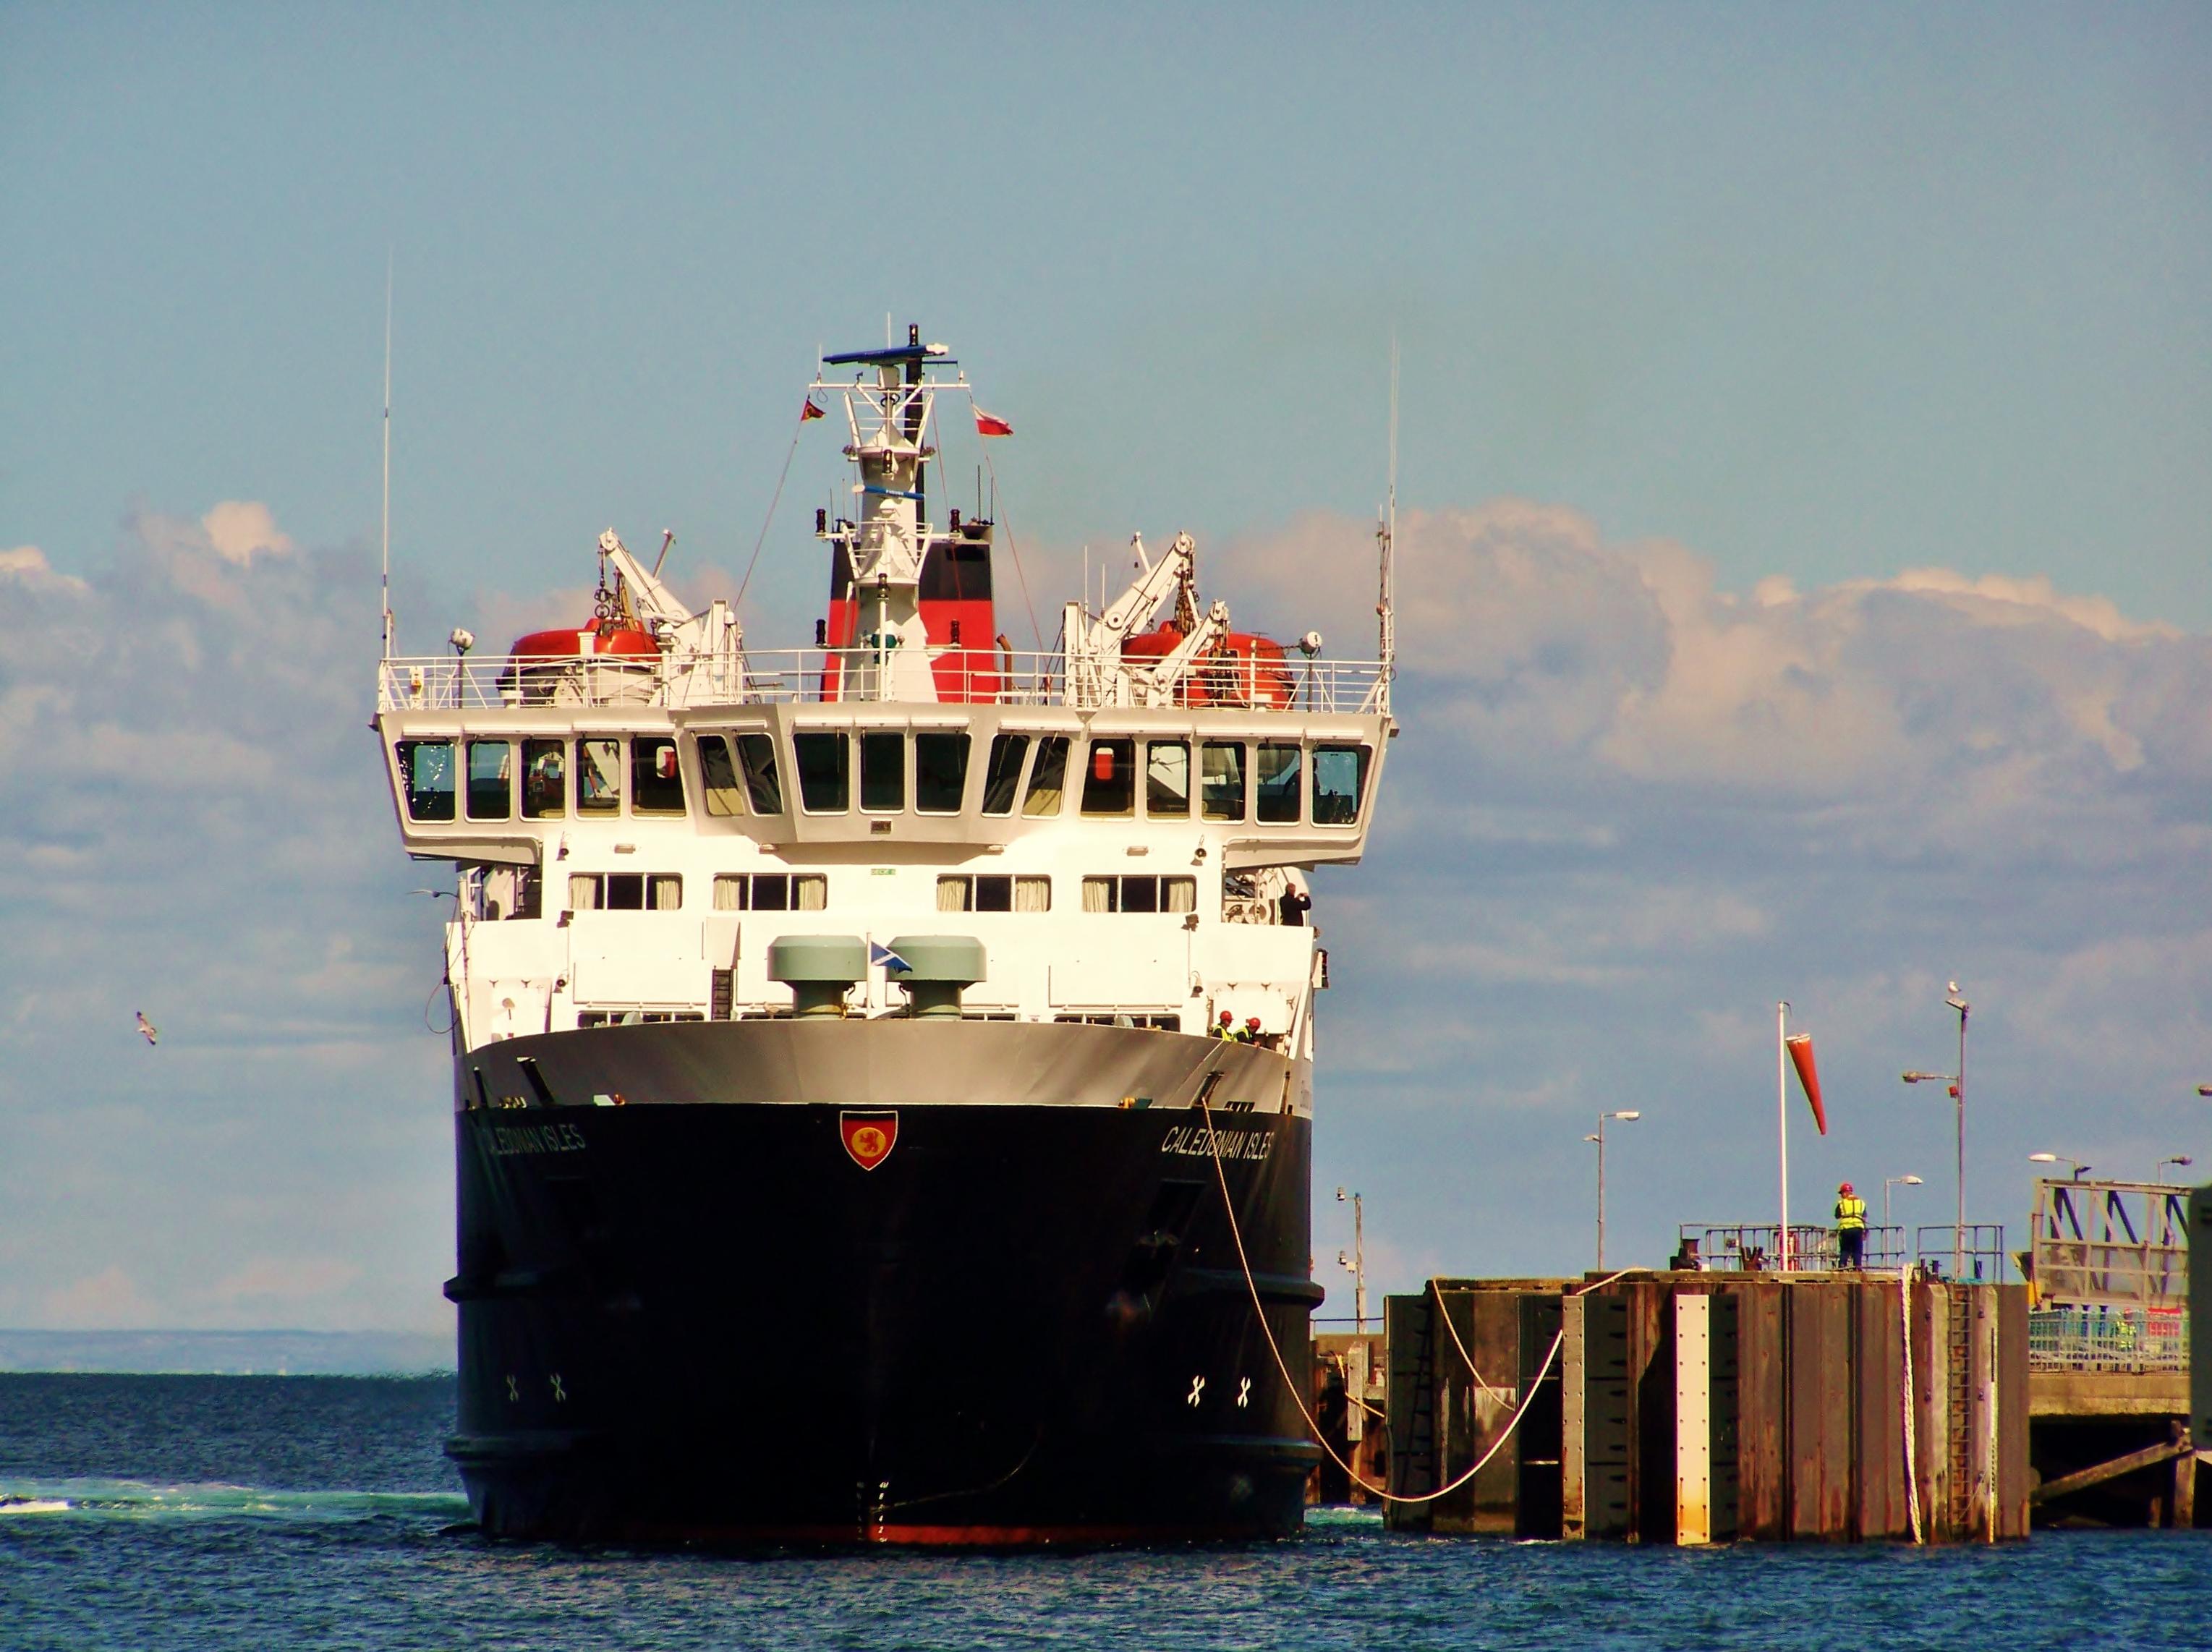 Caledonian Isles arriving at Brodick (Ships of CalMac)